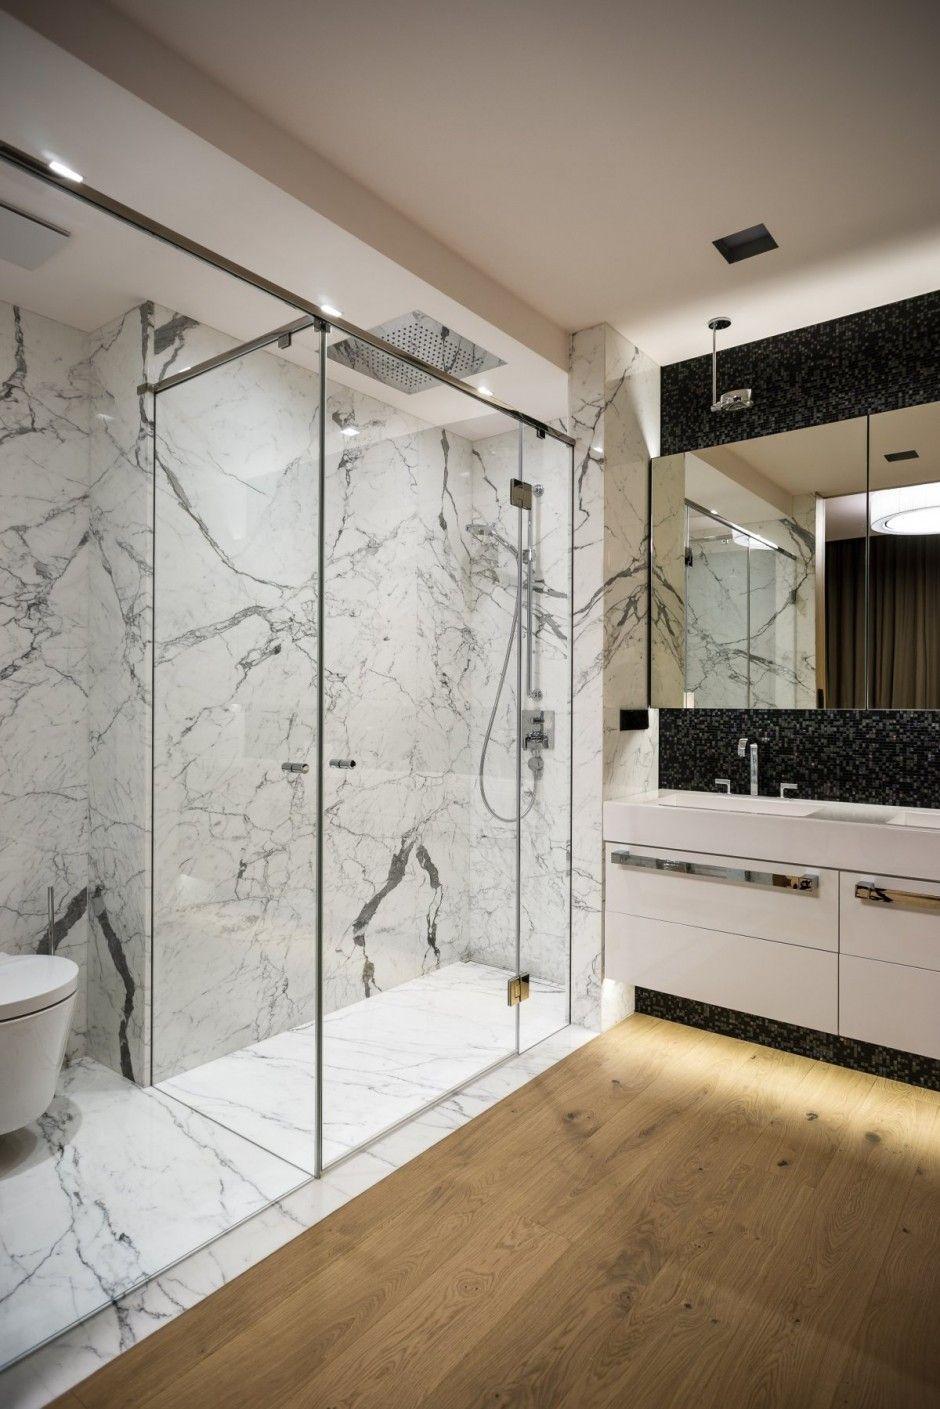 Ww 250513 37 Minimalist Bathroom Design Trendy Bathroom Designs Minimalist Bathroom